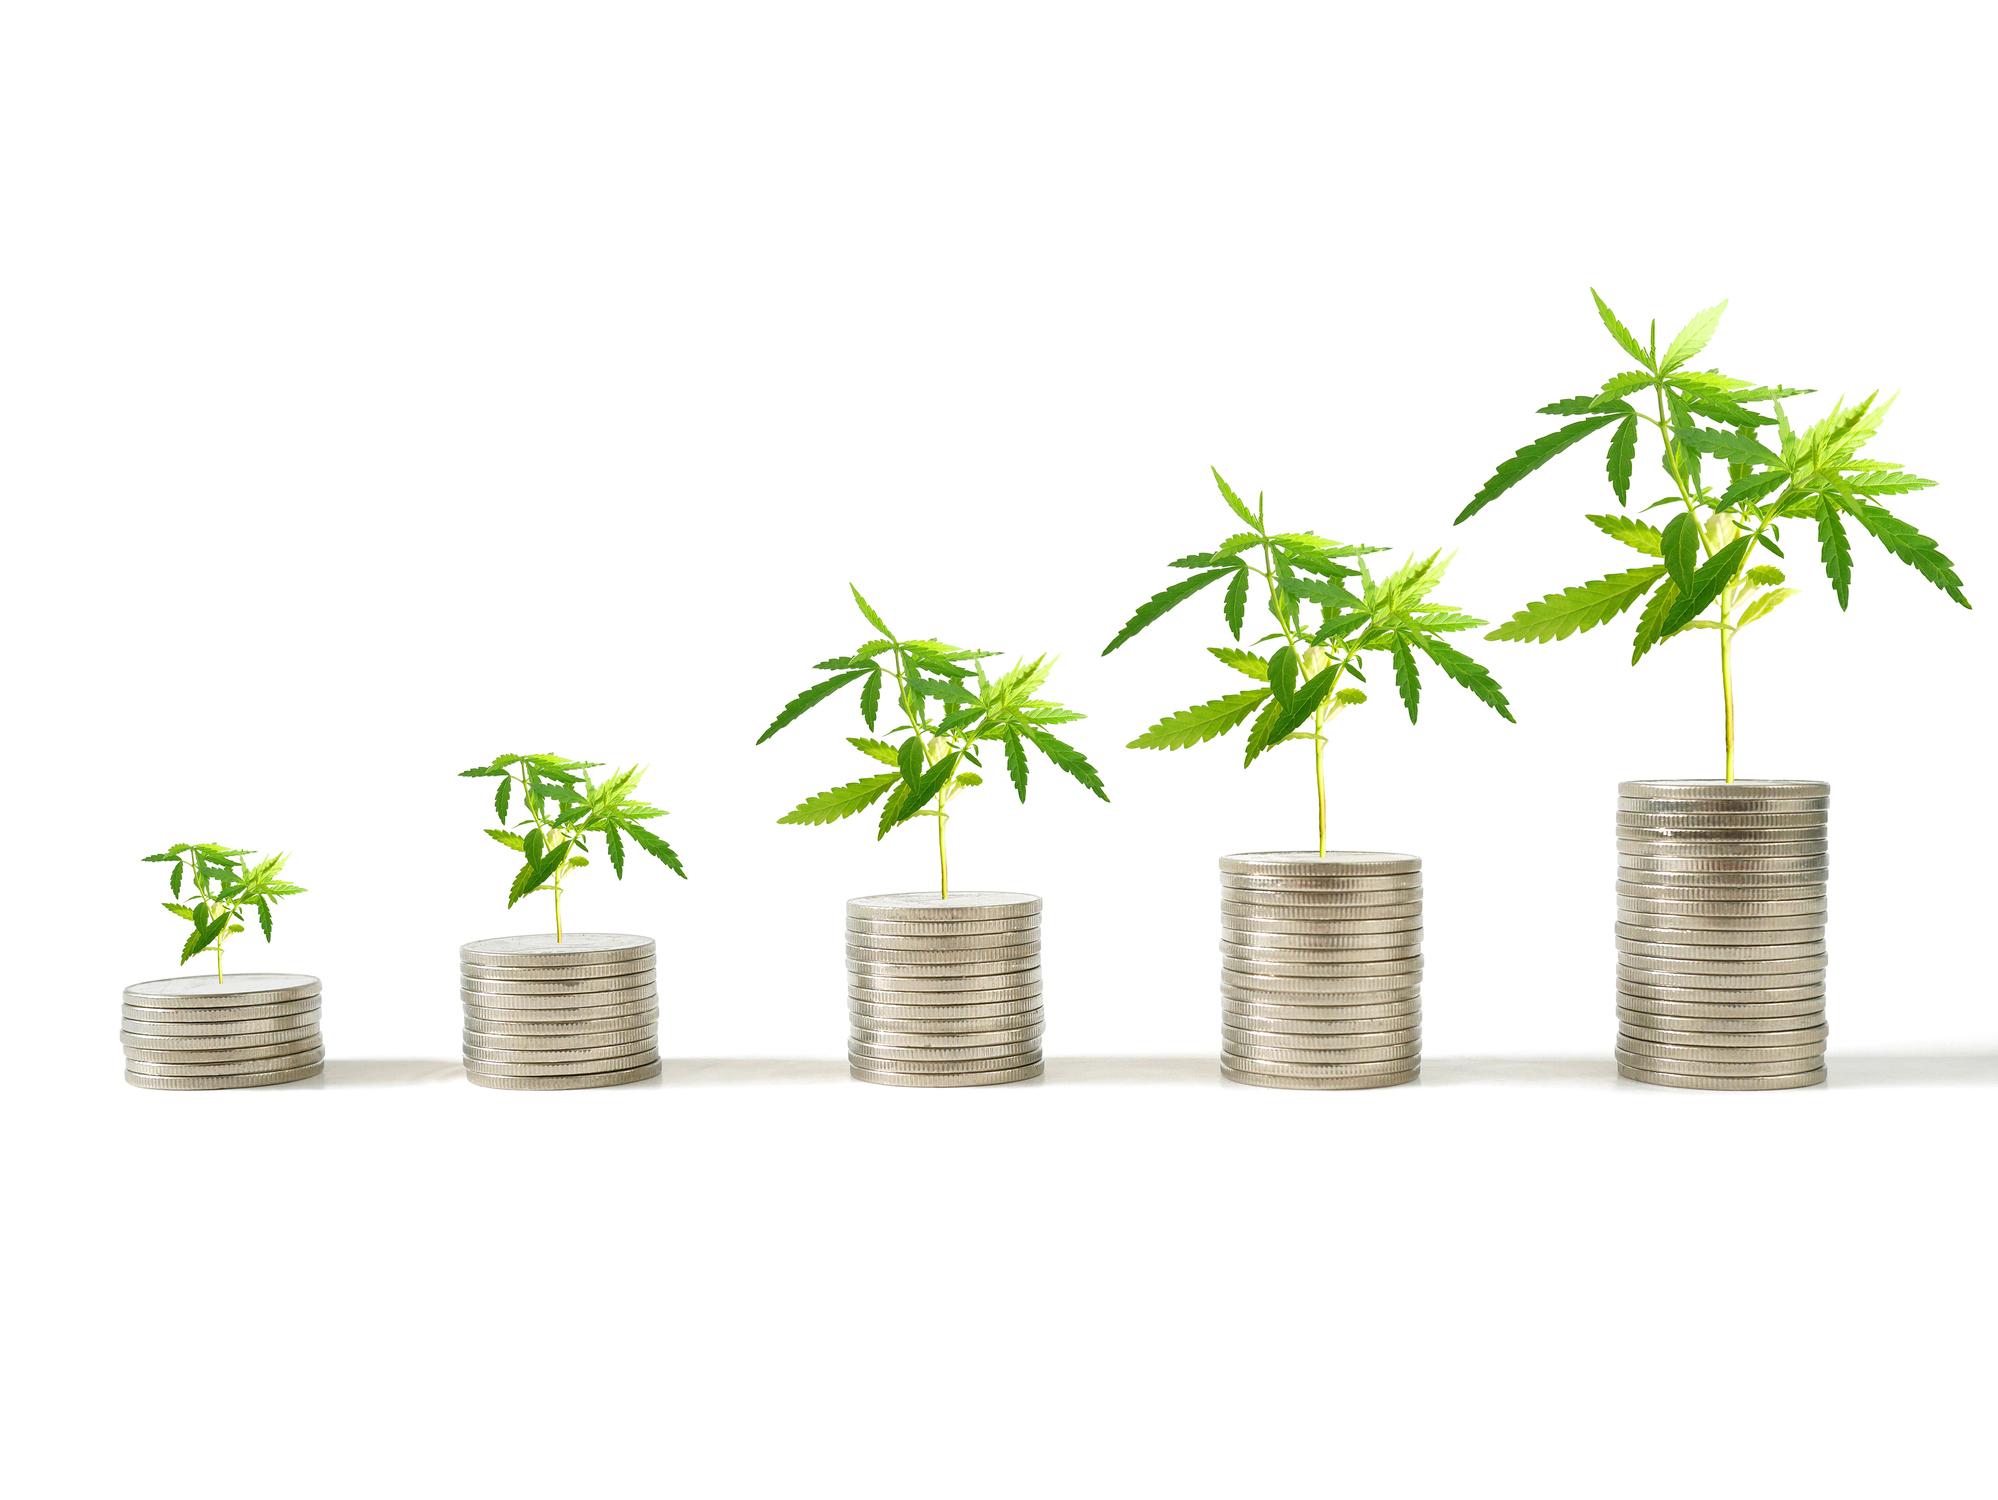 3 Small-Cap Marijuana Stocks That Could Be Humongous Winners | The Motley Fool